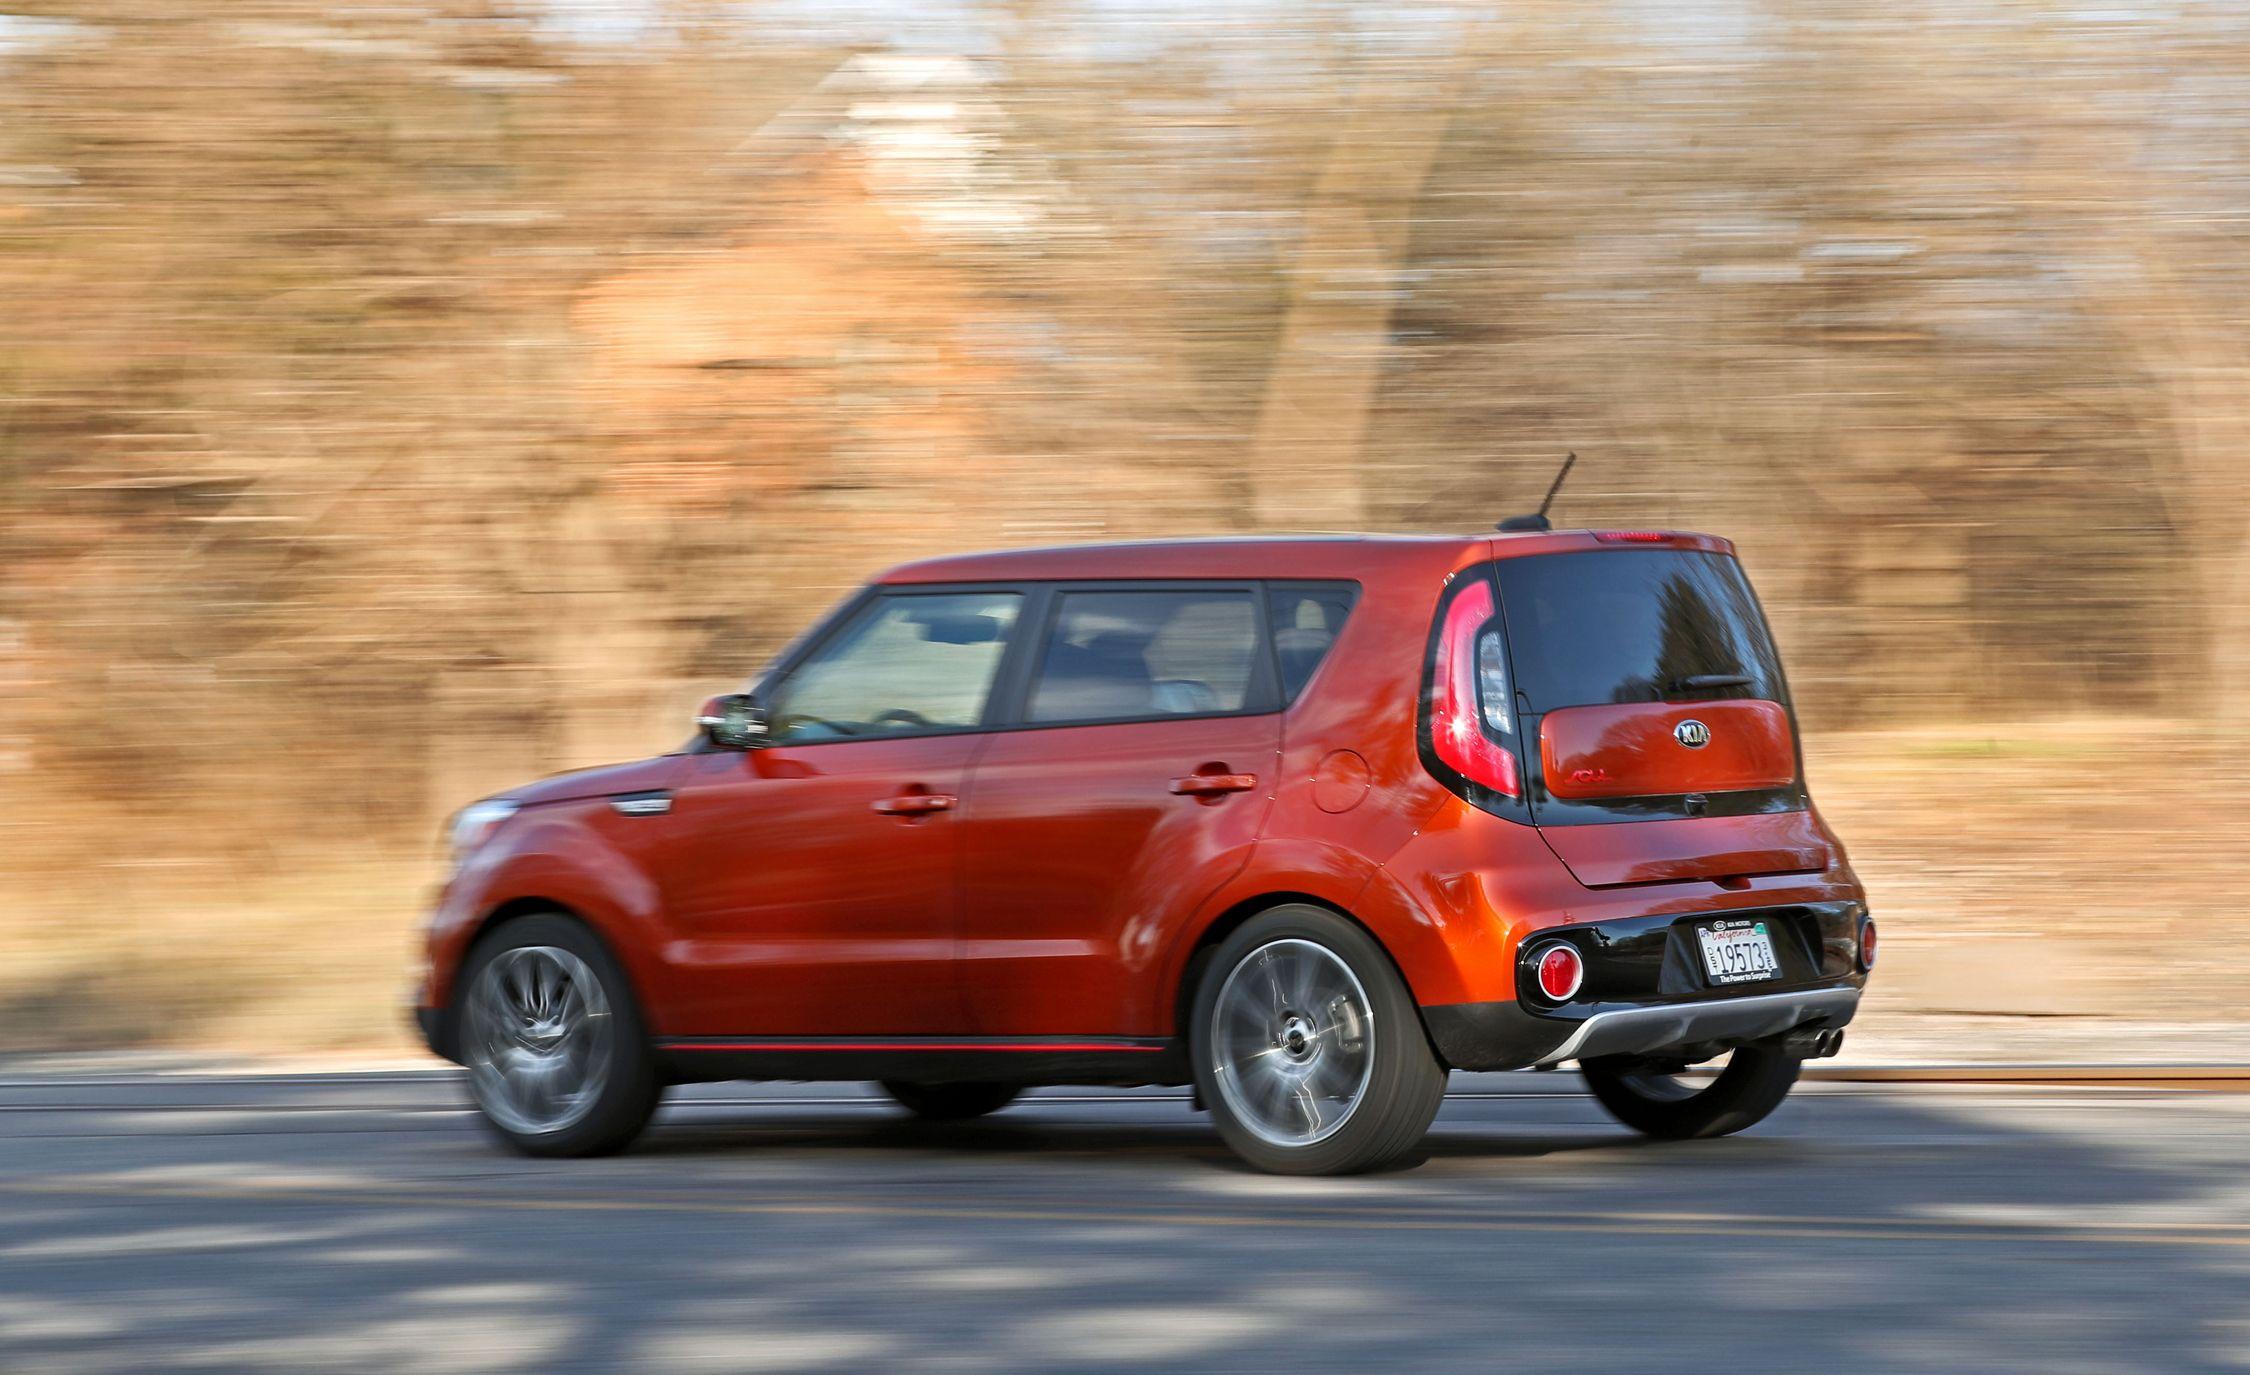 2017 kia soul fuel economy review car and driver rh caranddriver com 2015 Kia Soul Front Orange Kia Soul